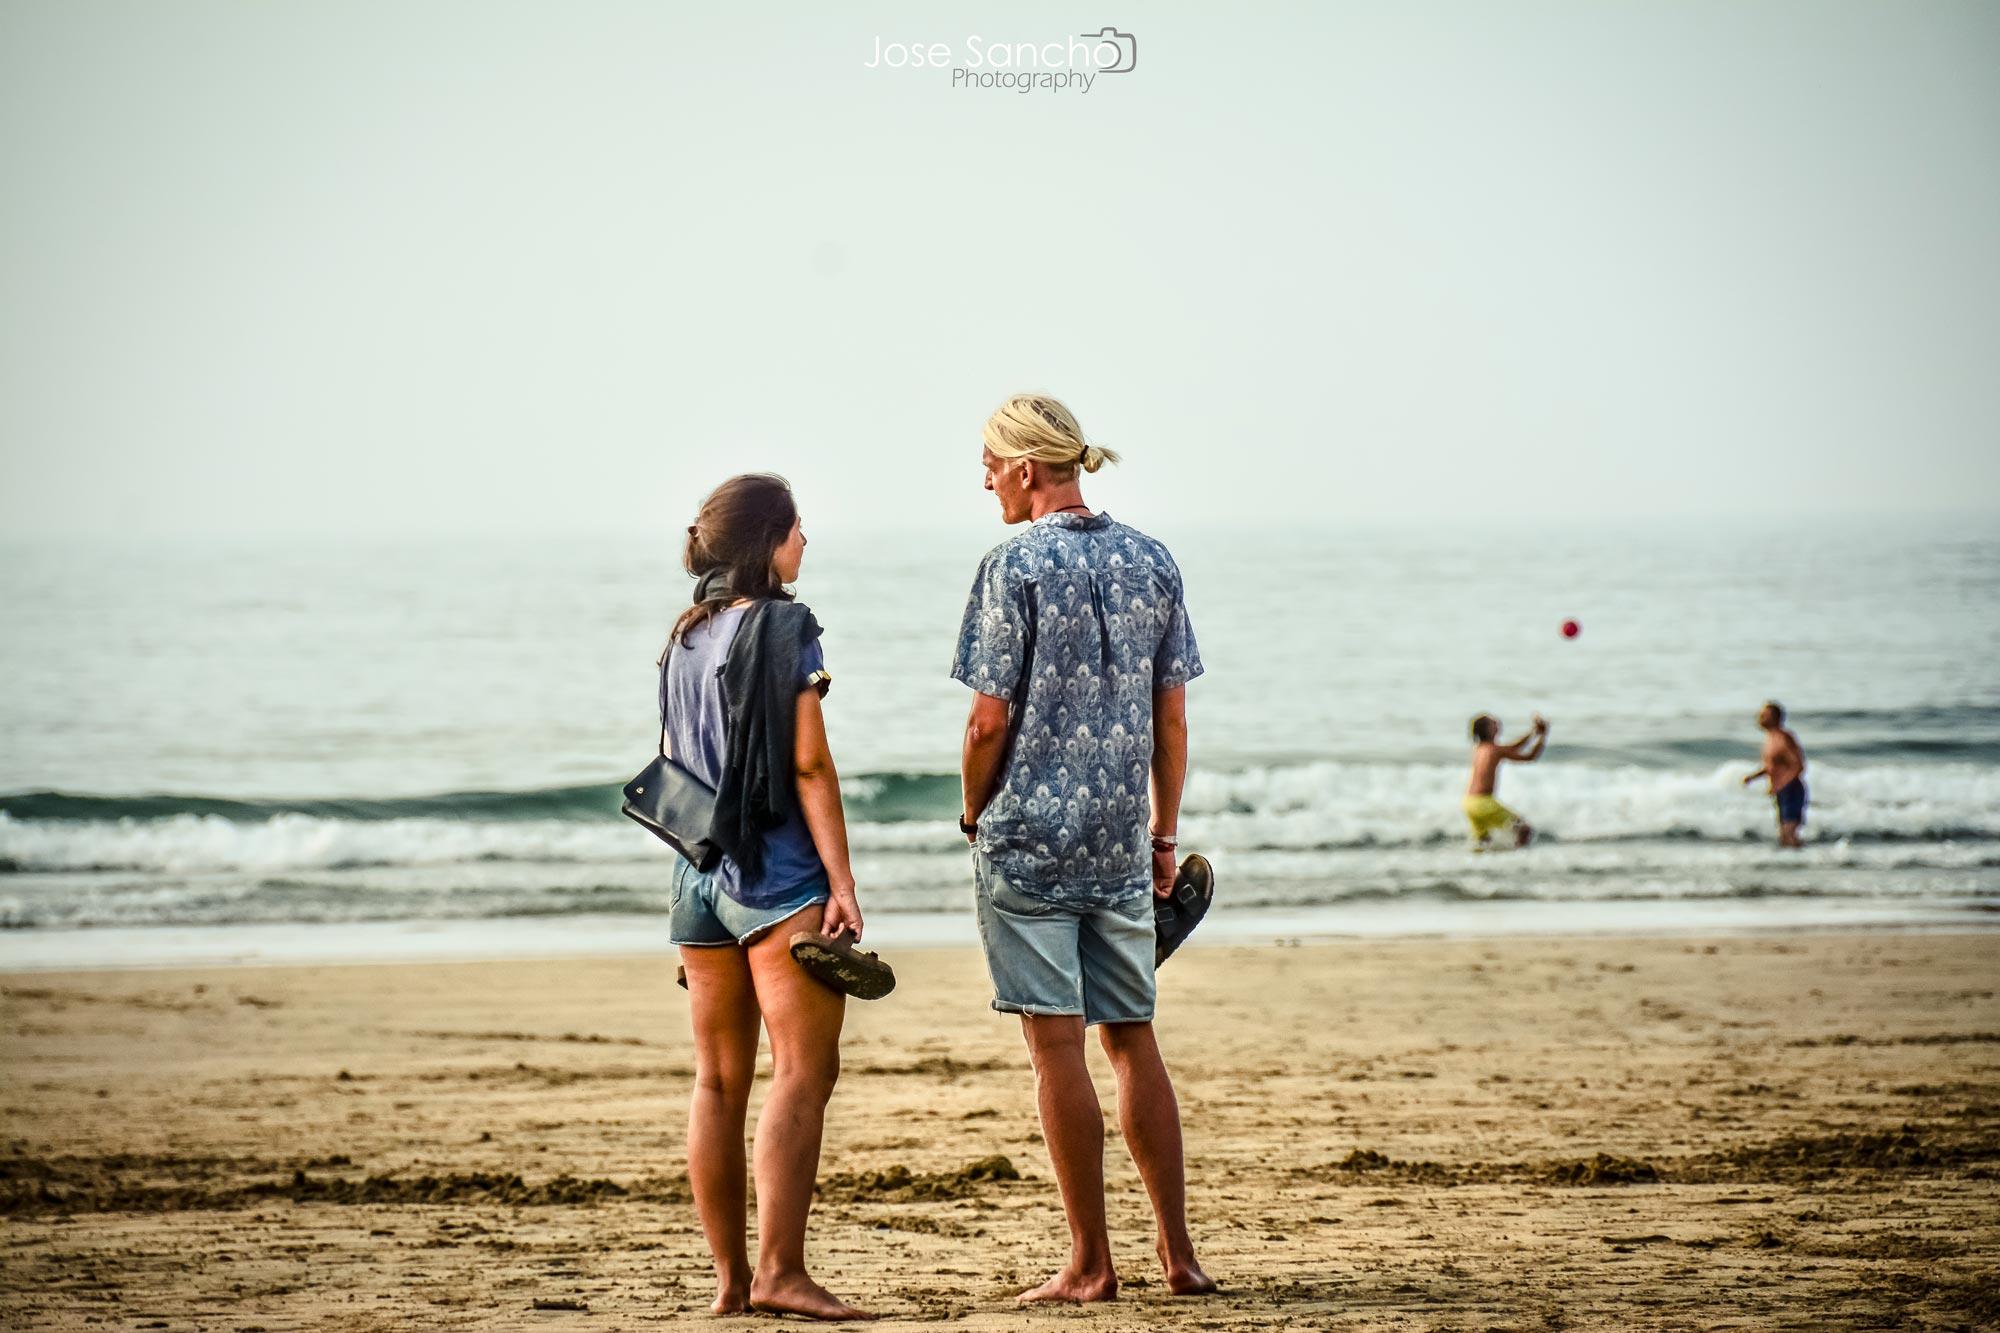 Playa - Jose Sancho Photography